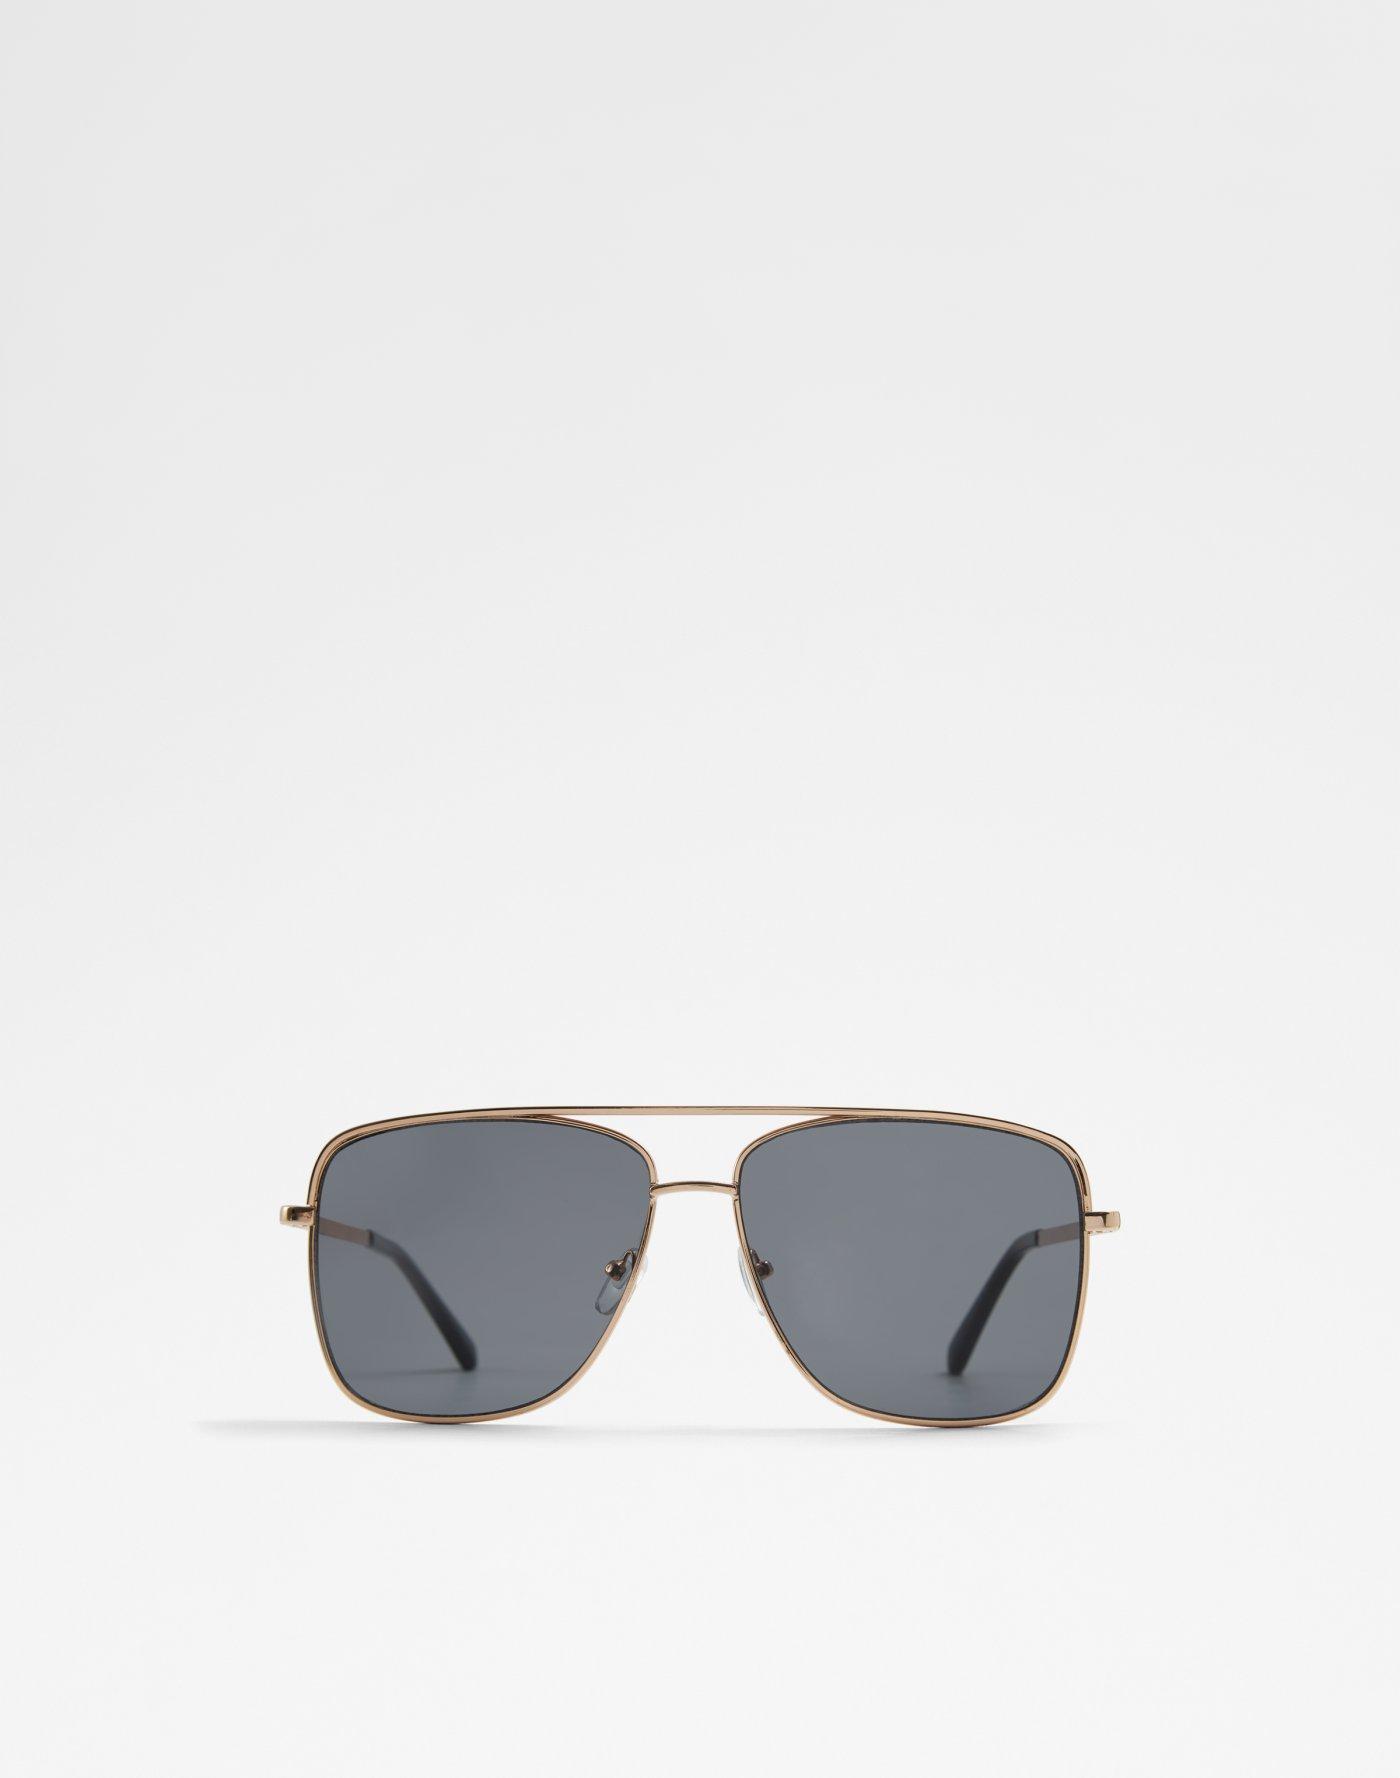 Sunglasses   Aldoshoes.com US 3ee7b83f625b